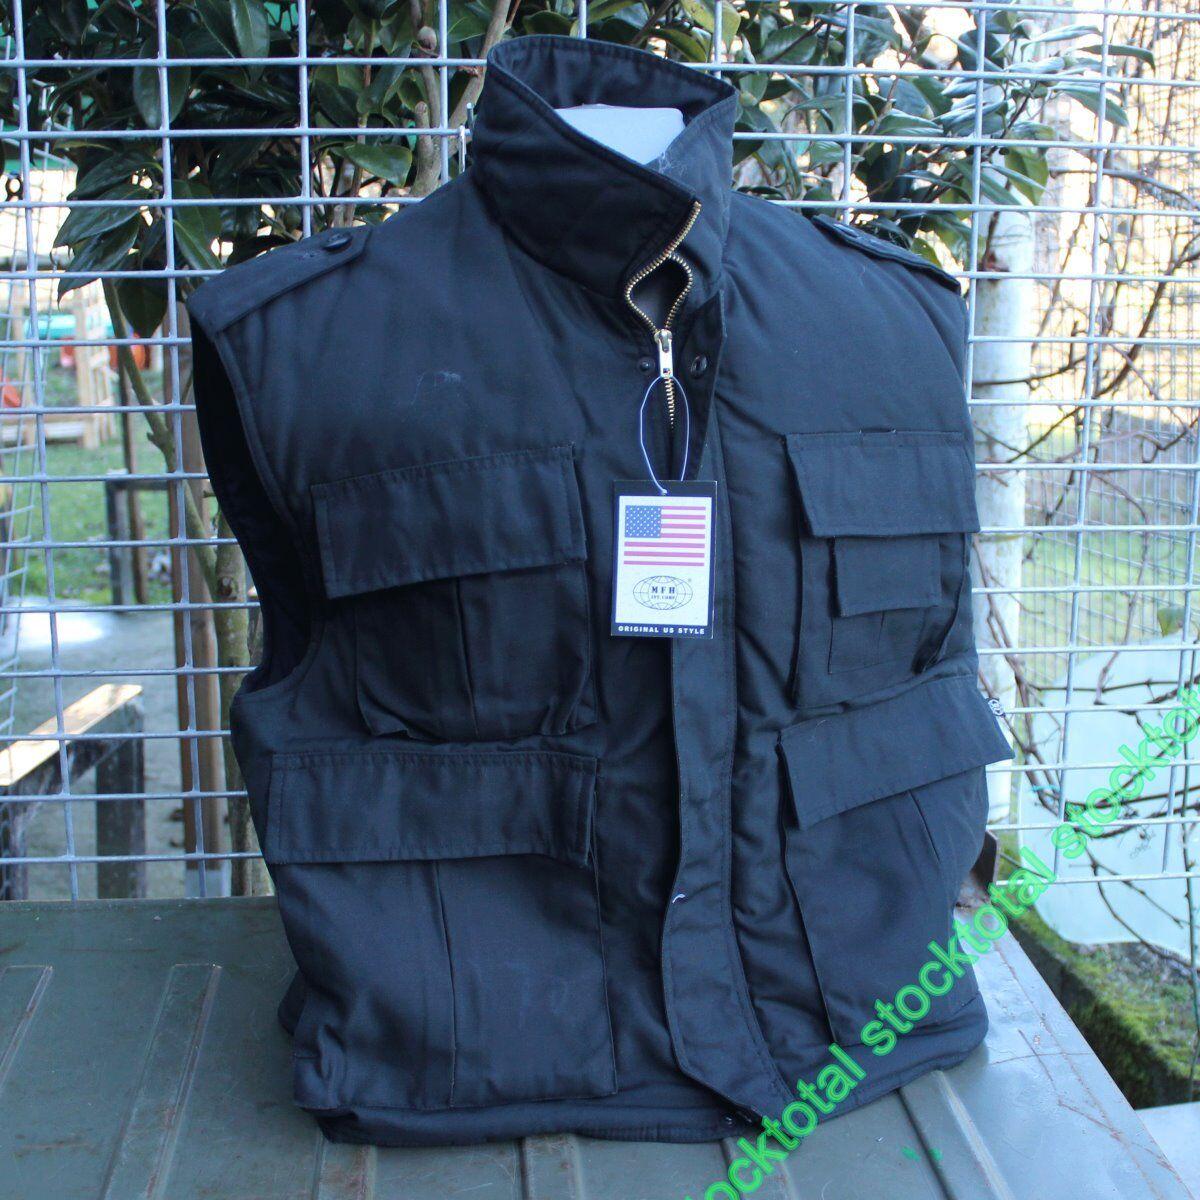 EEUU EEUU EEUU chaleco, Ranger, negro,  forrado con muchos bolsillos TALLA M 04102A ae34f5